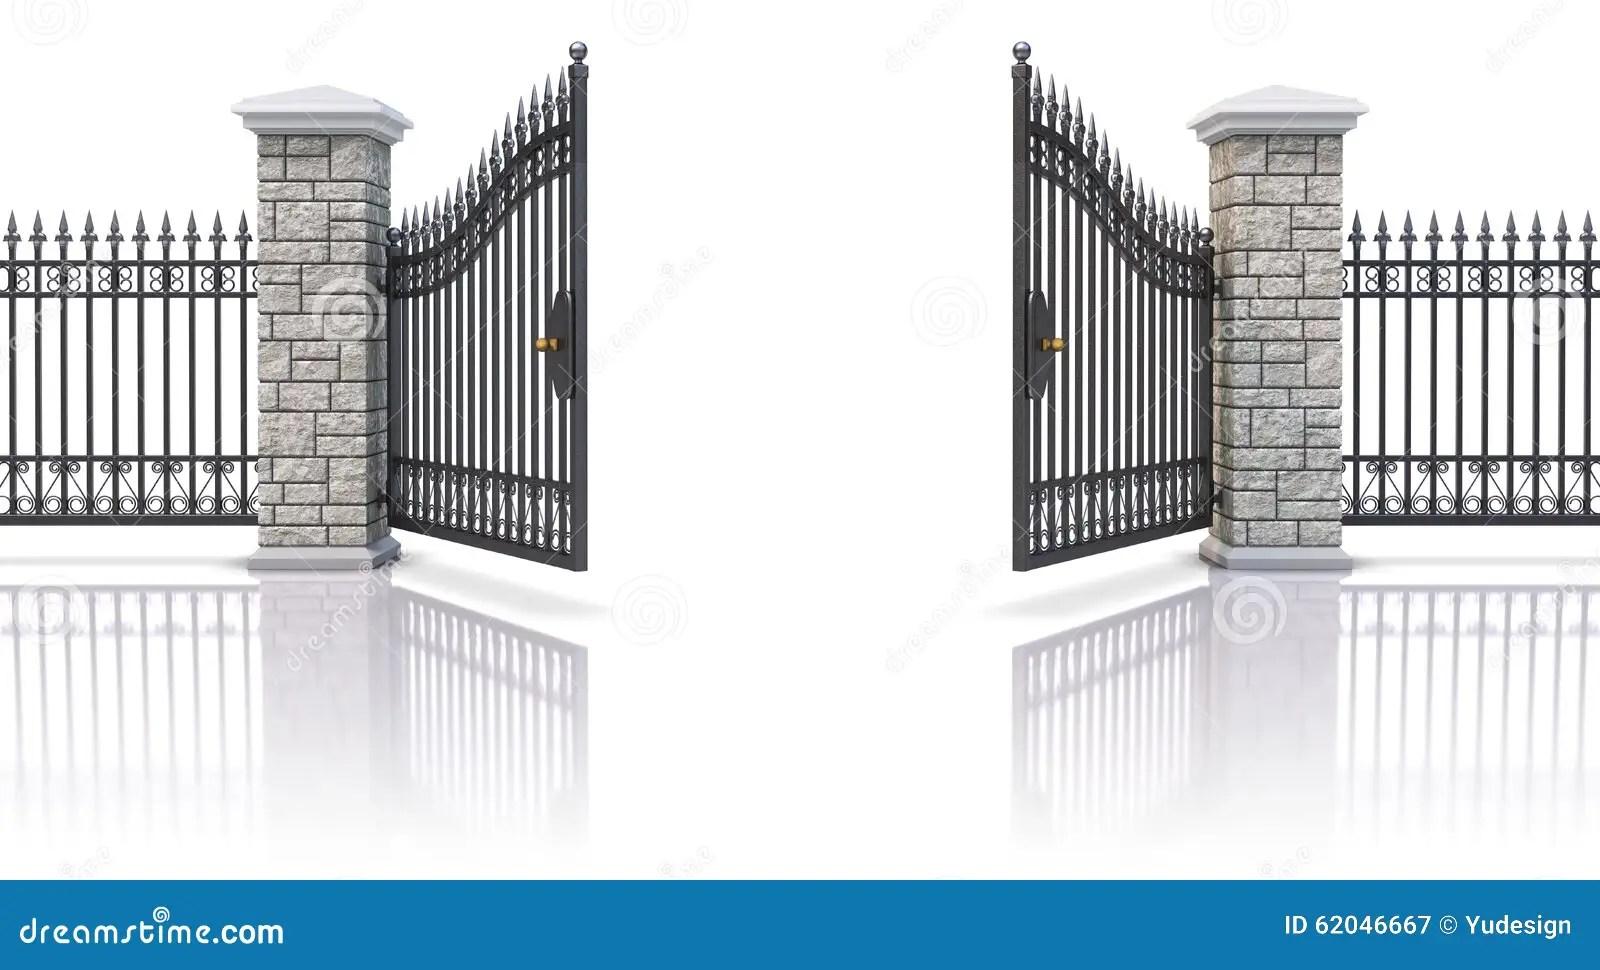 Open Iron Gate Stock Illustration Illustration Of Fence